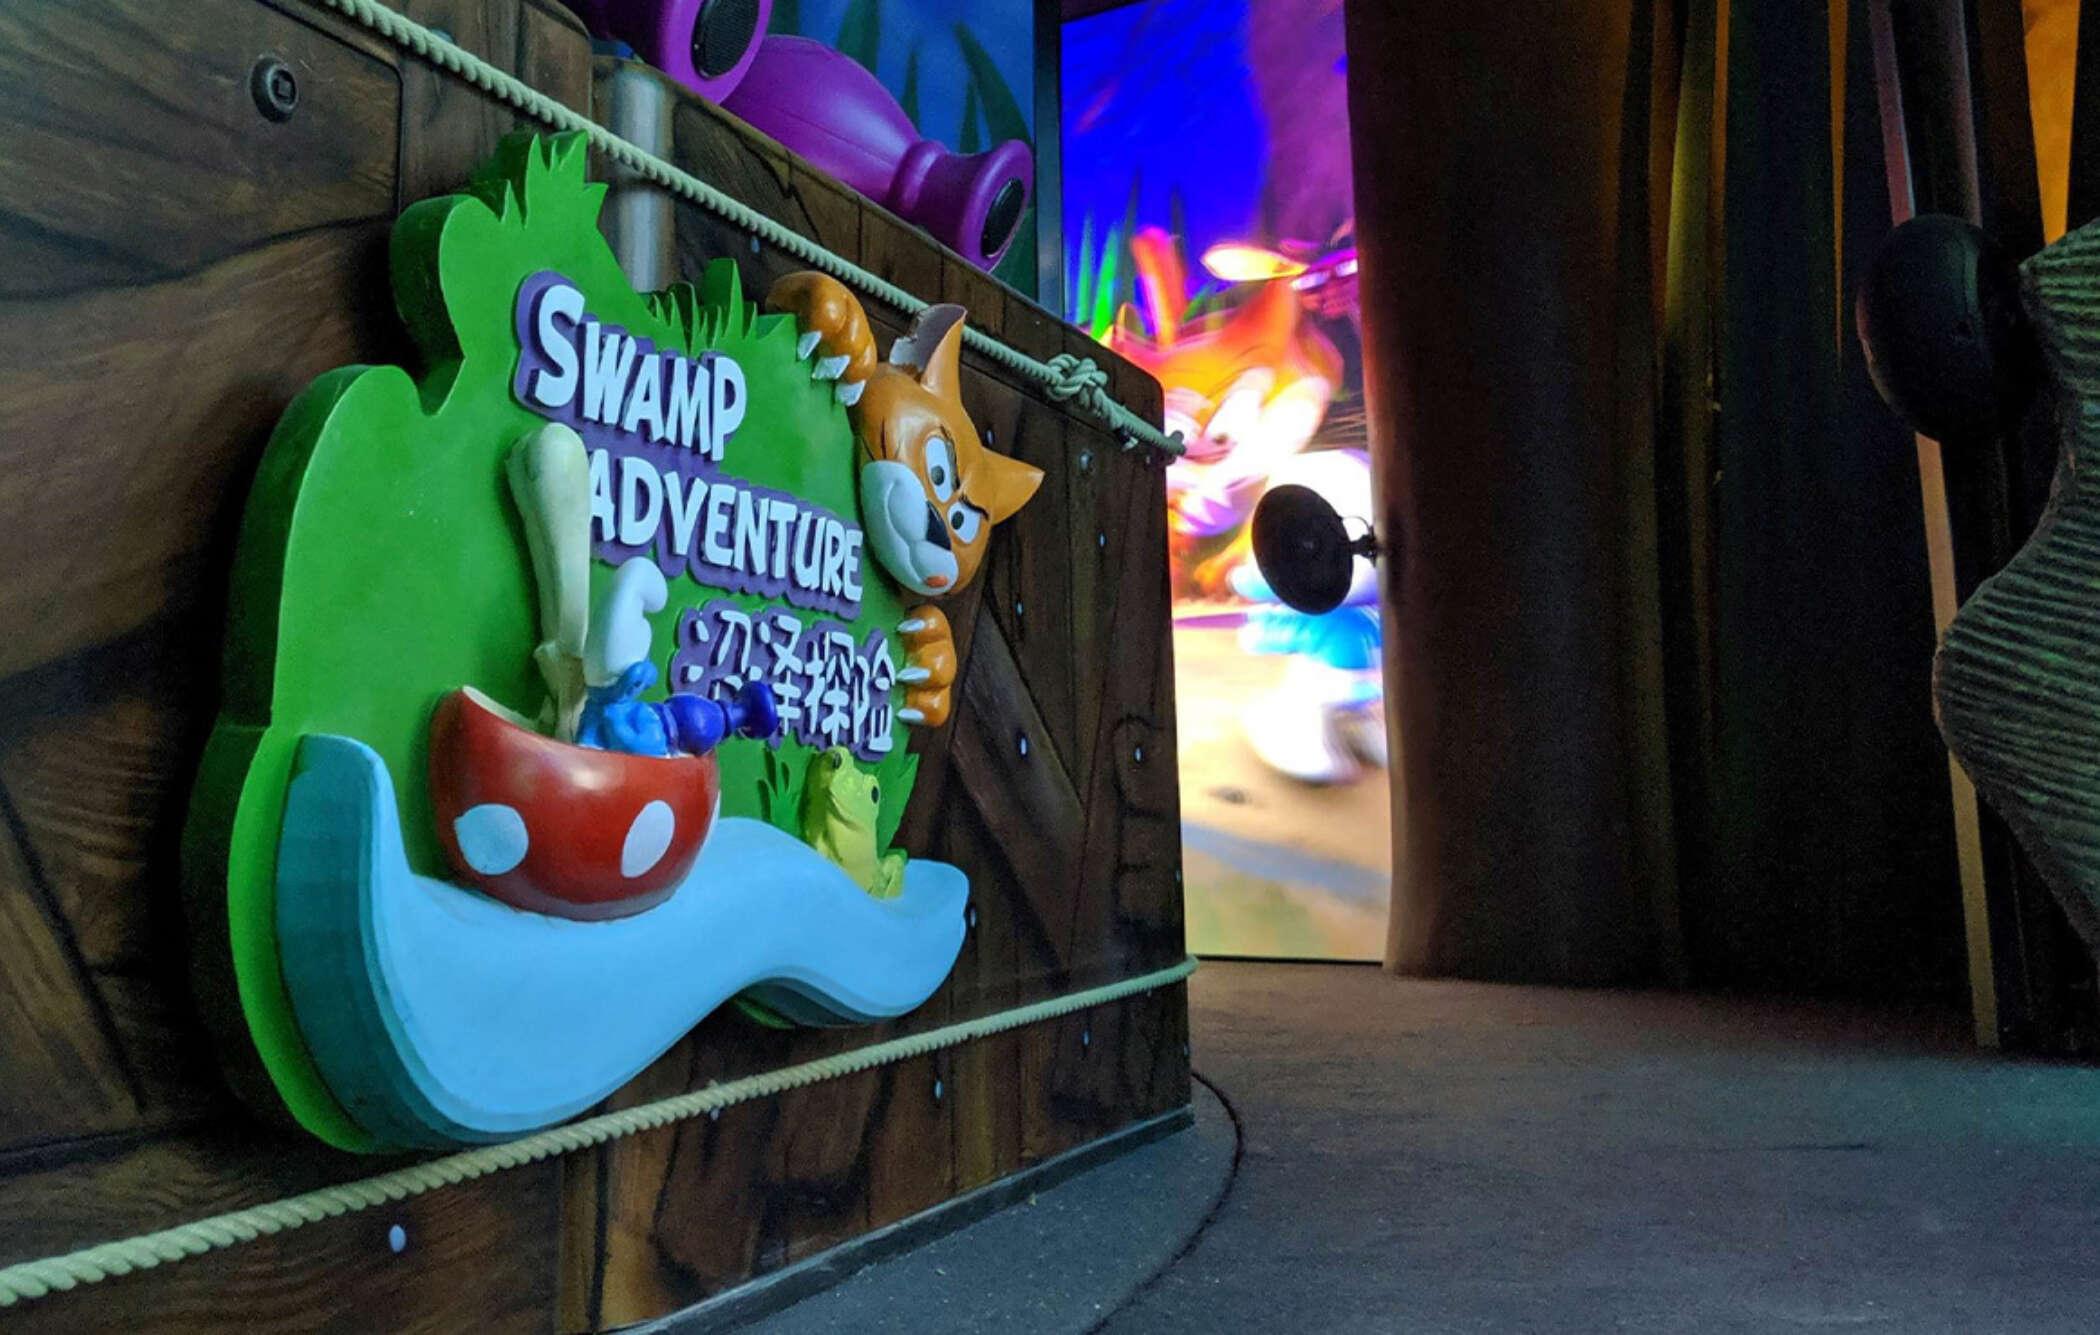 Smurfs Game Changer 2